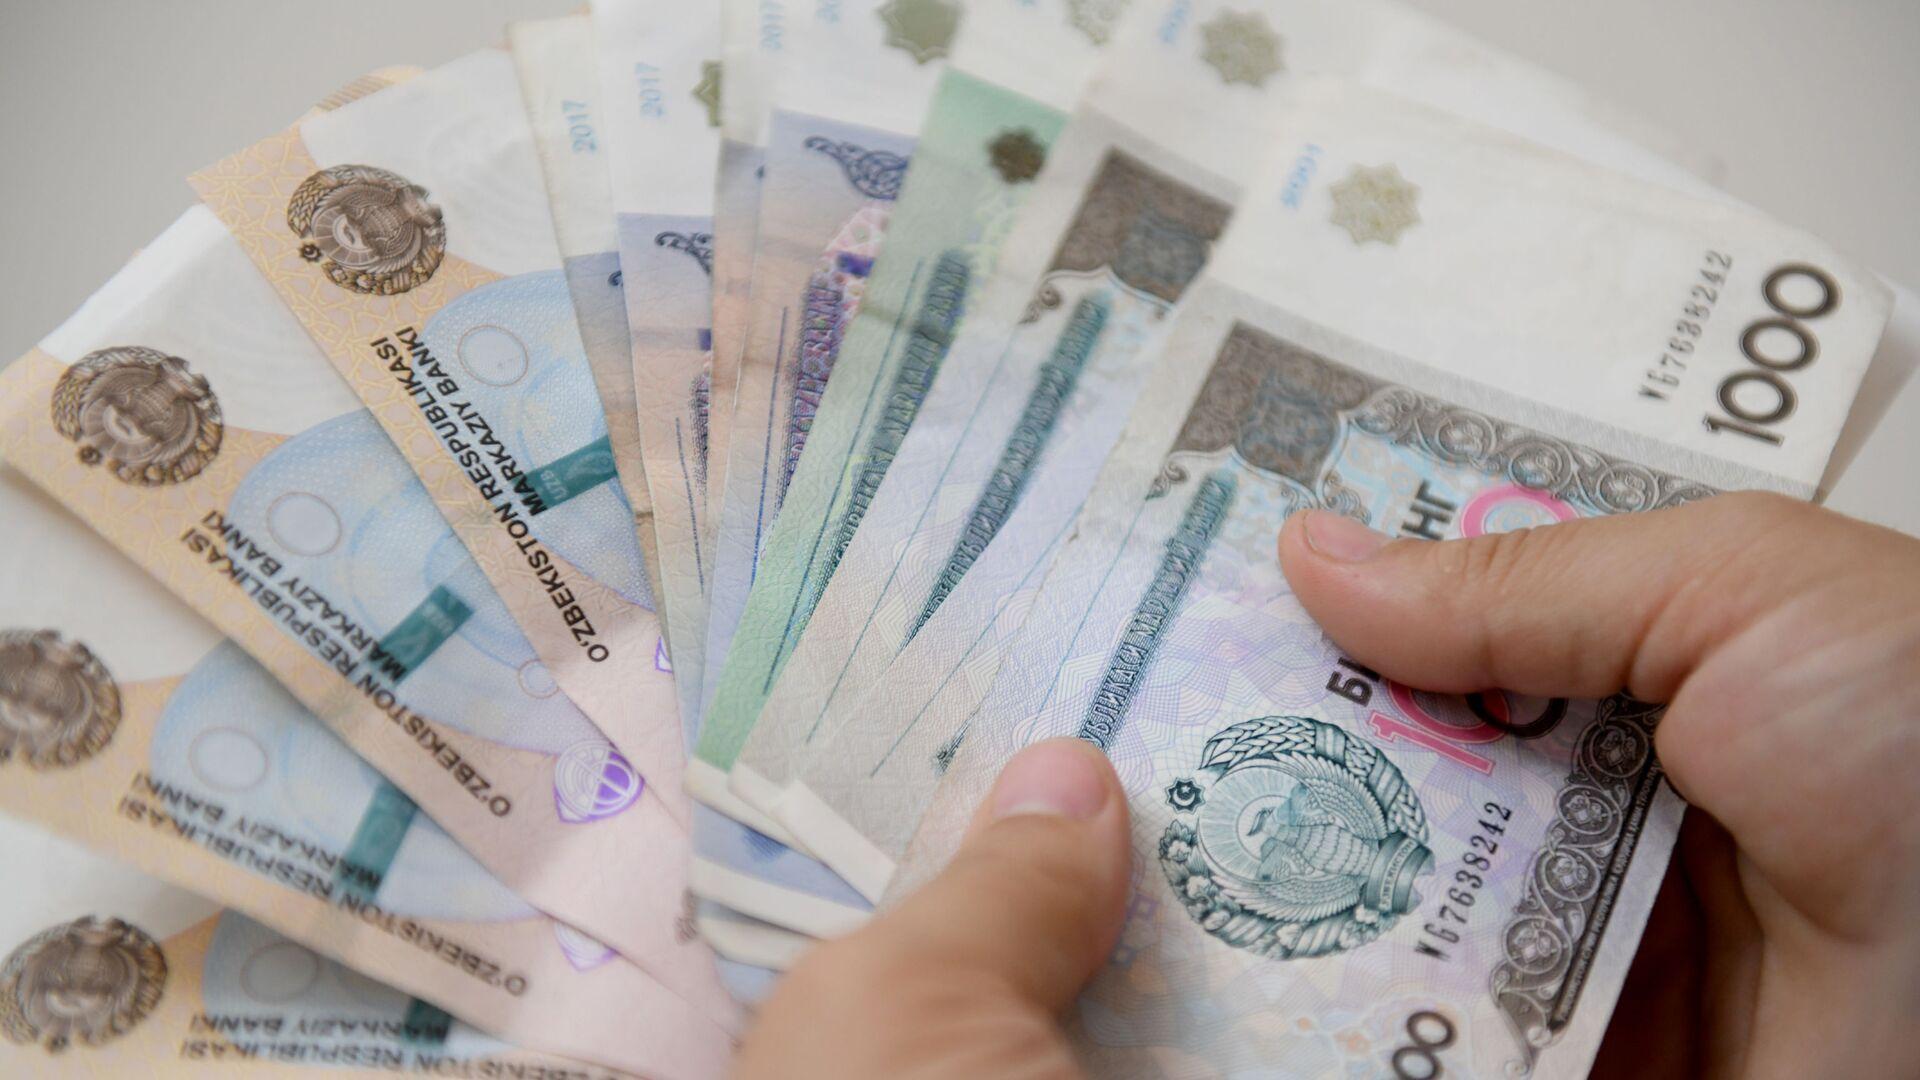 Национальная валюта Узбекистана — сум - Sputnik Ўзбекистон, 1920, 18.08.2021